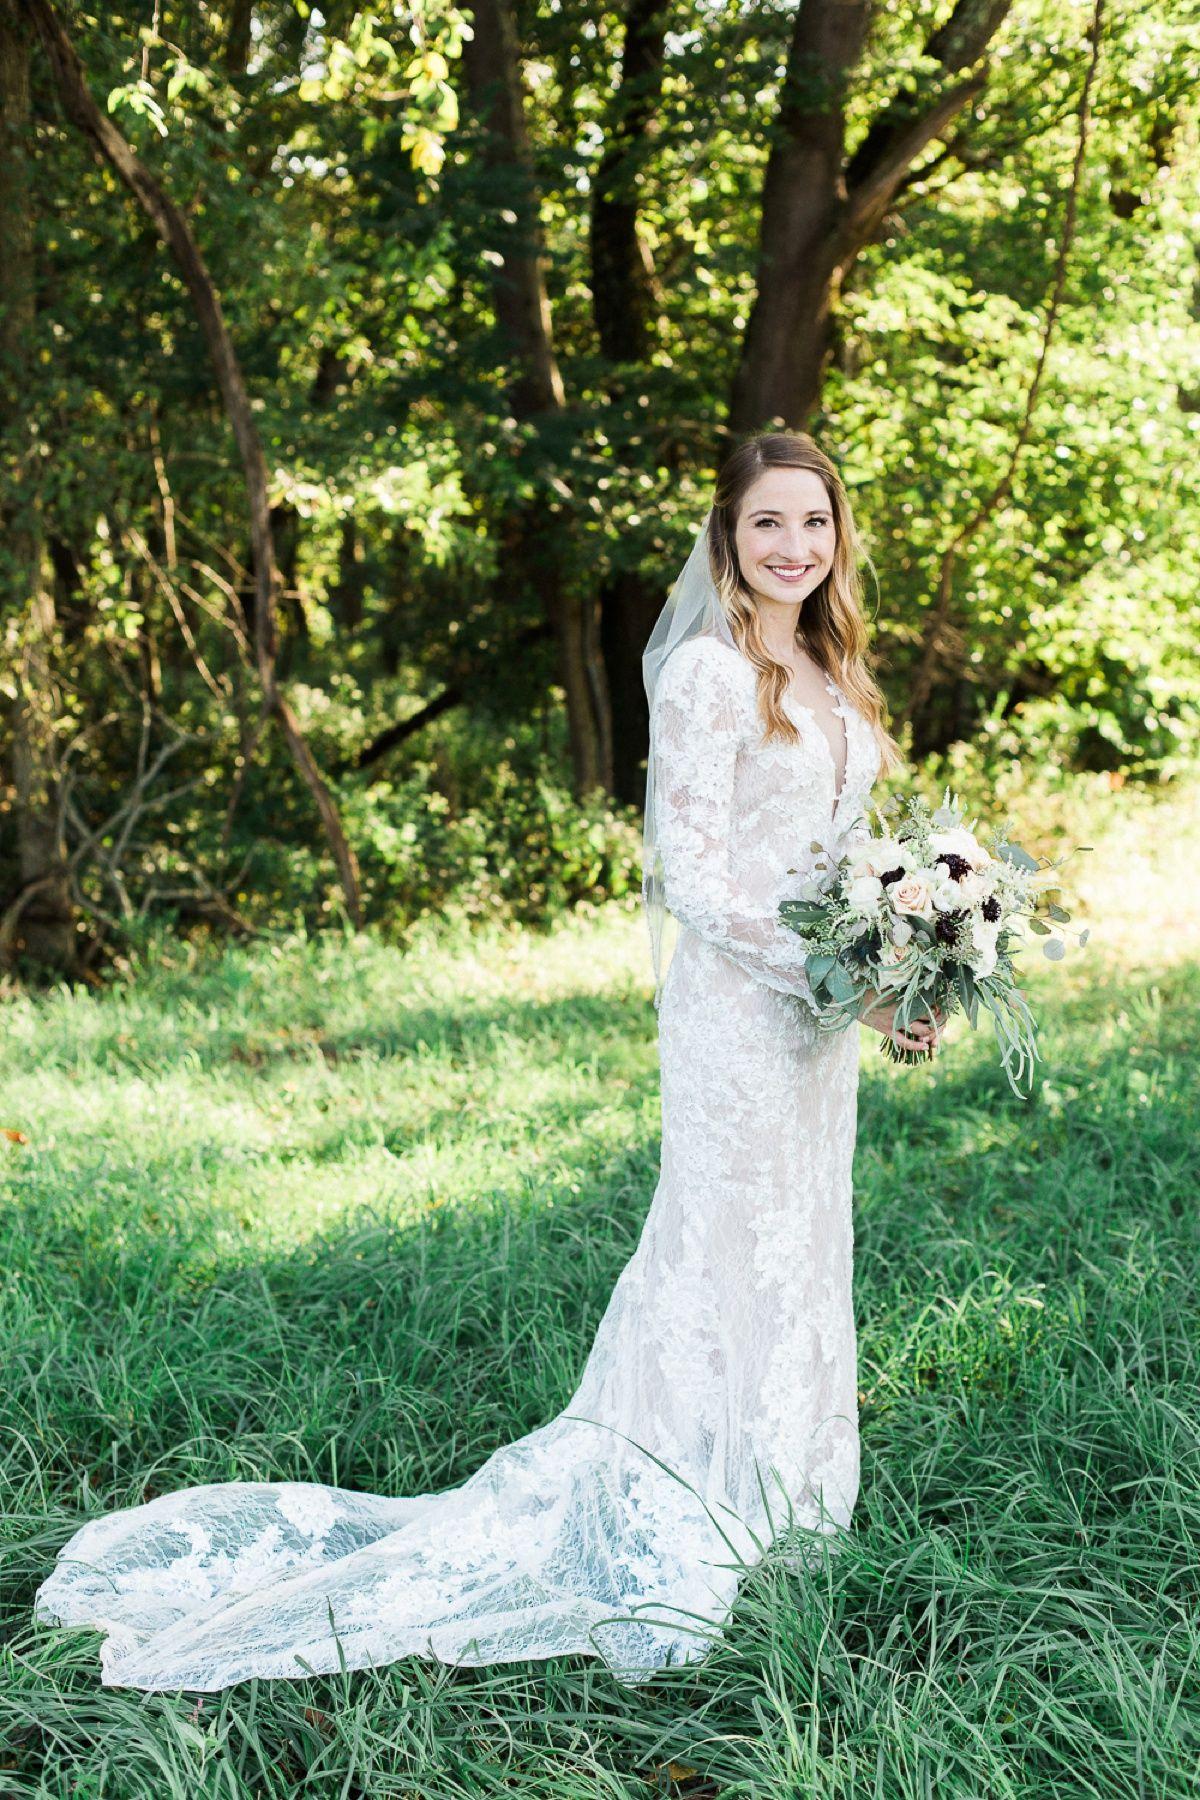 Wedding Dresses: Best of 2017 | Sleeved wedding dresses, Wedding ...